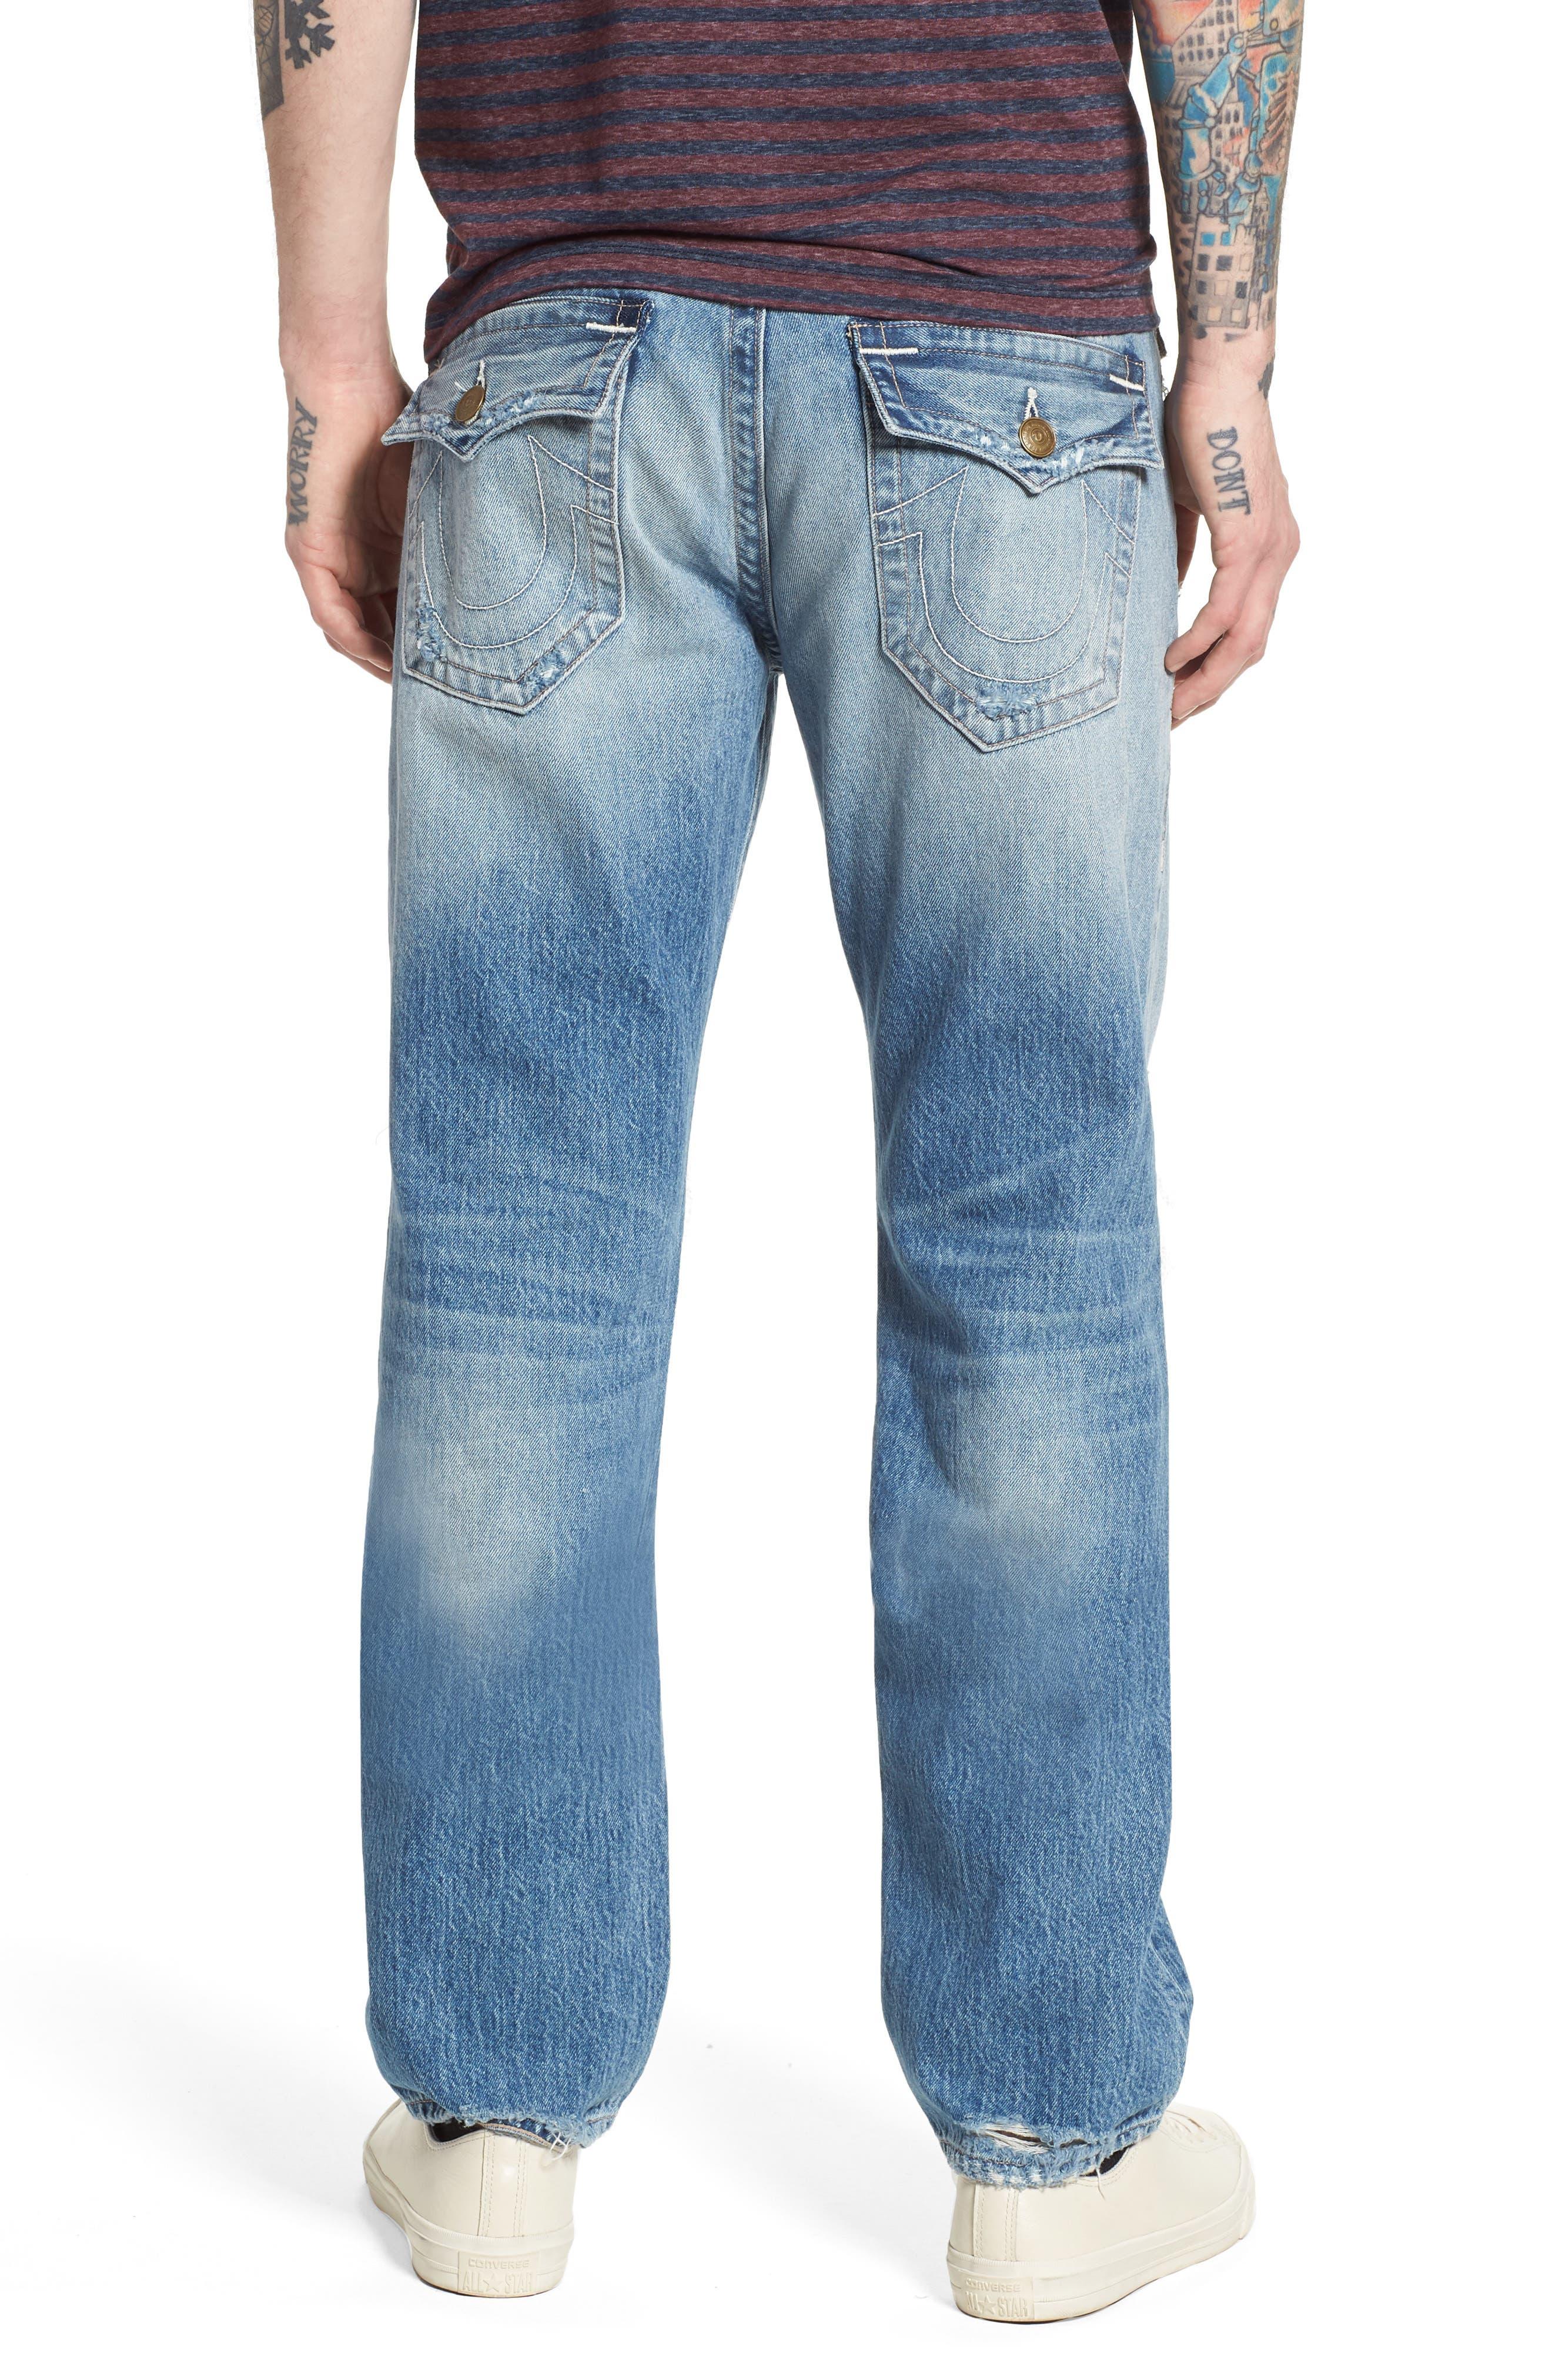 Geno Straight Leg Jeans,                             Alternate thumbnail 2, color,                             Eqnm Delinguent